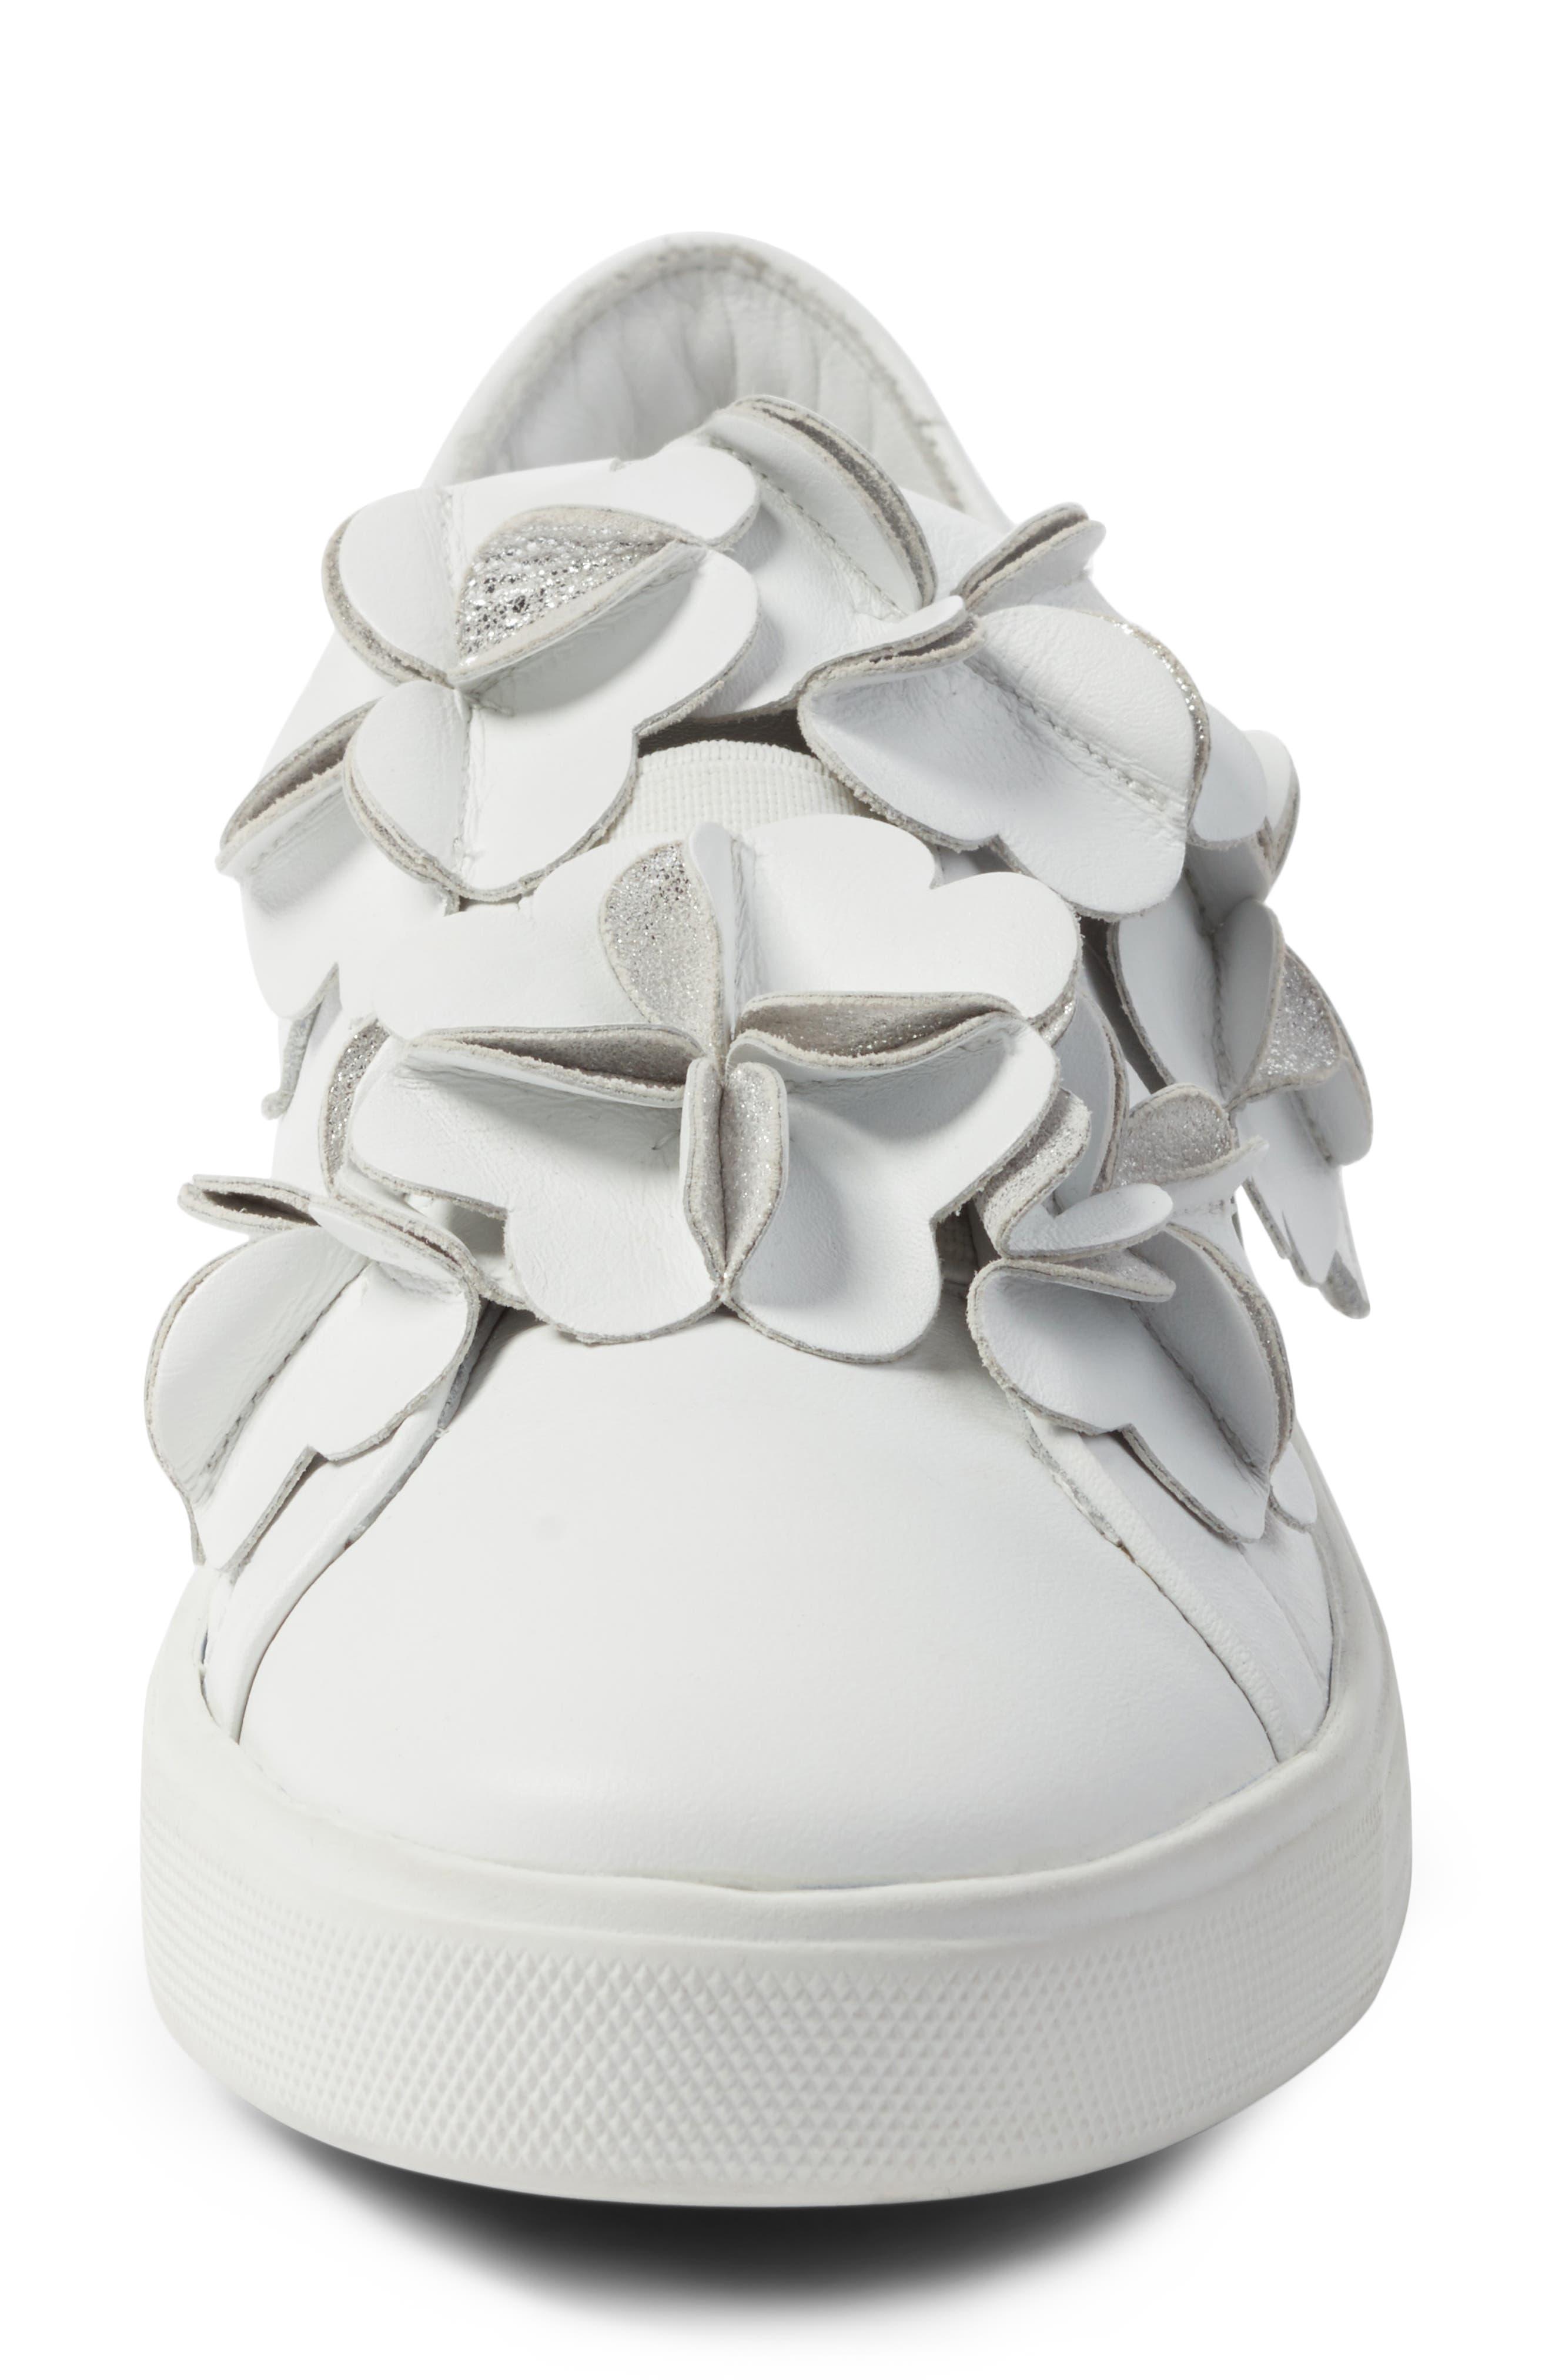 Kennel & Schmenger Town Floral Embellished Sneaker,                             Alternate thumbnail 4, color,                             White/ Silver